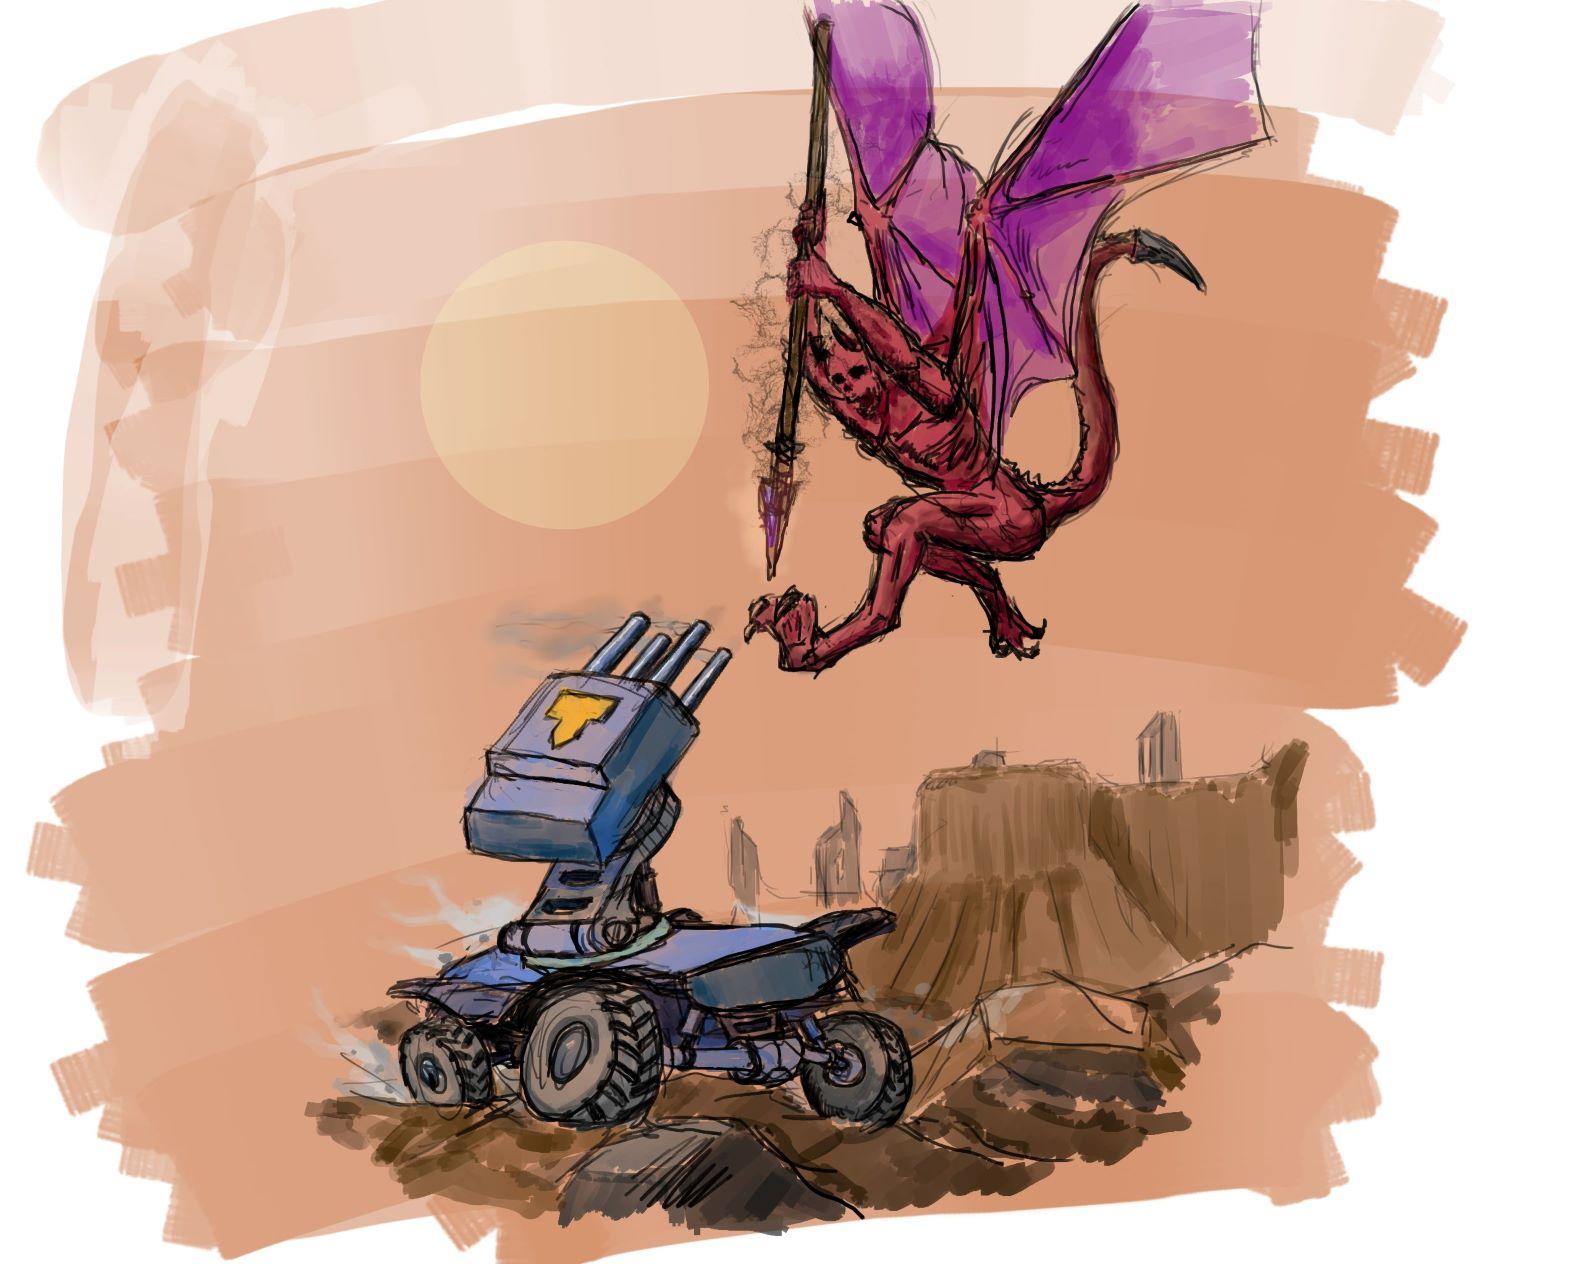 rover_vs_demon | Экспериментальная sci-fi RTS (переименовано)